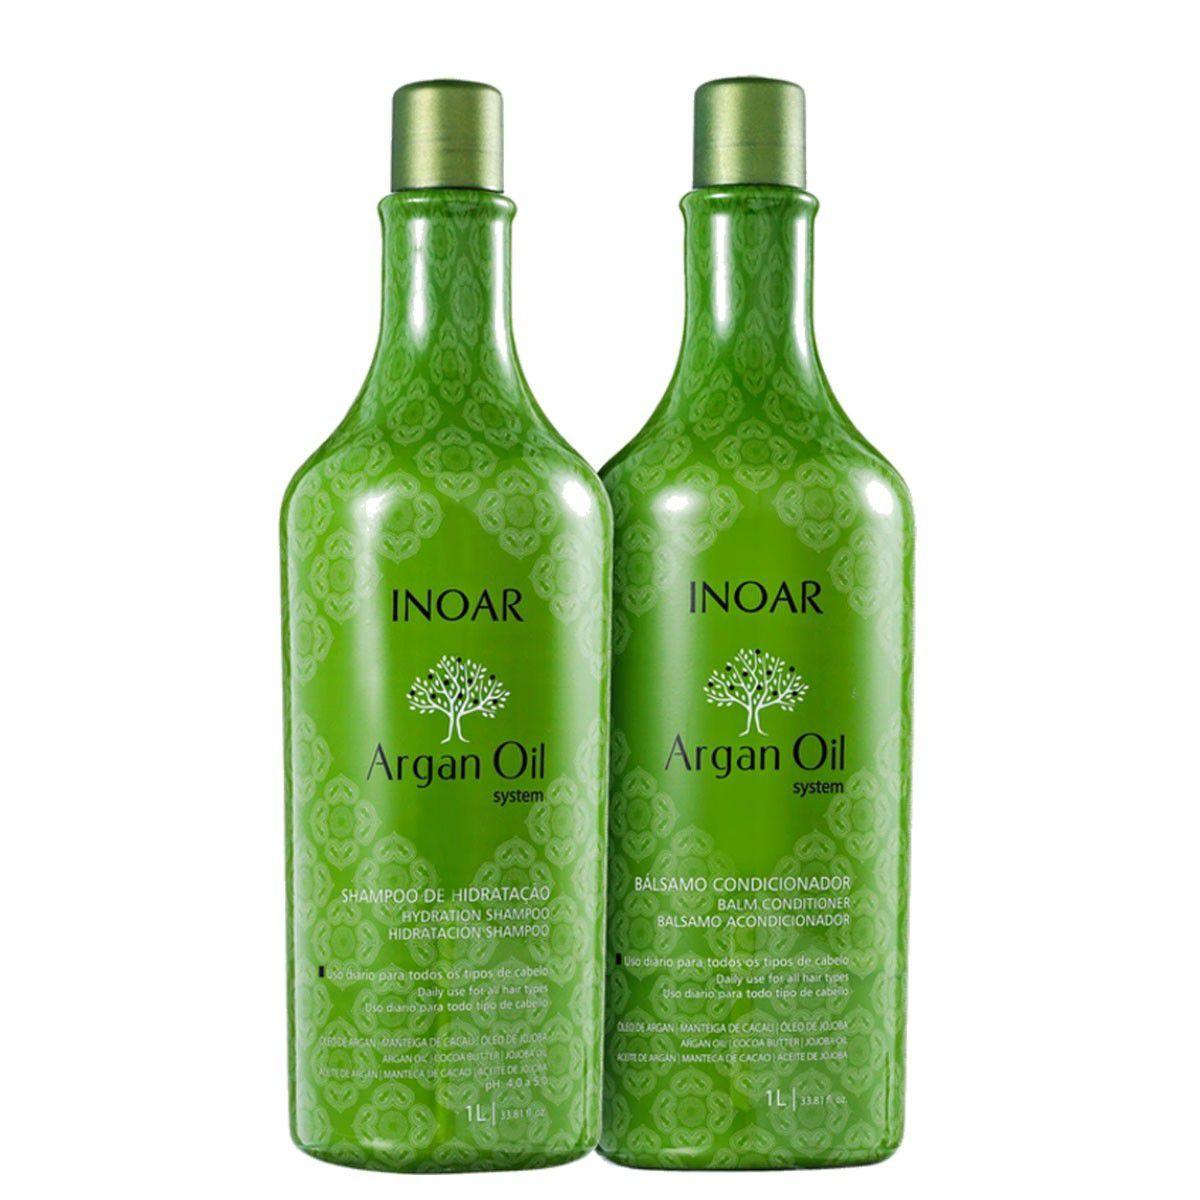 Kit Inoar Argan Oil - Shampoo + Condicionador + Máscara